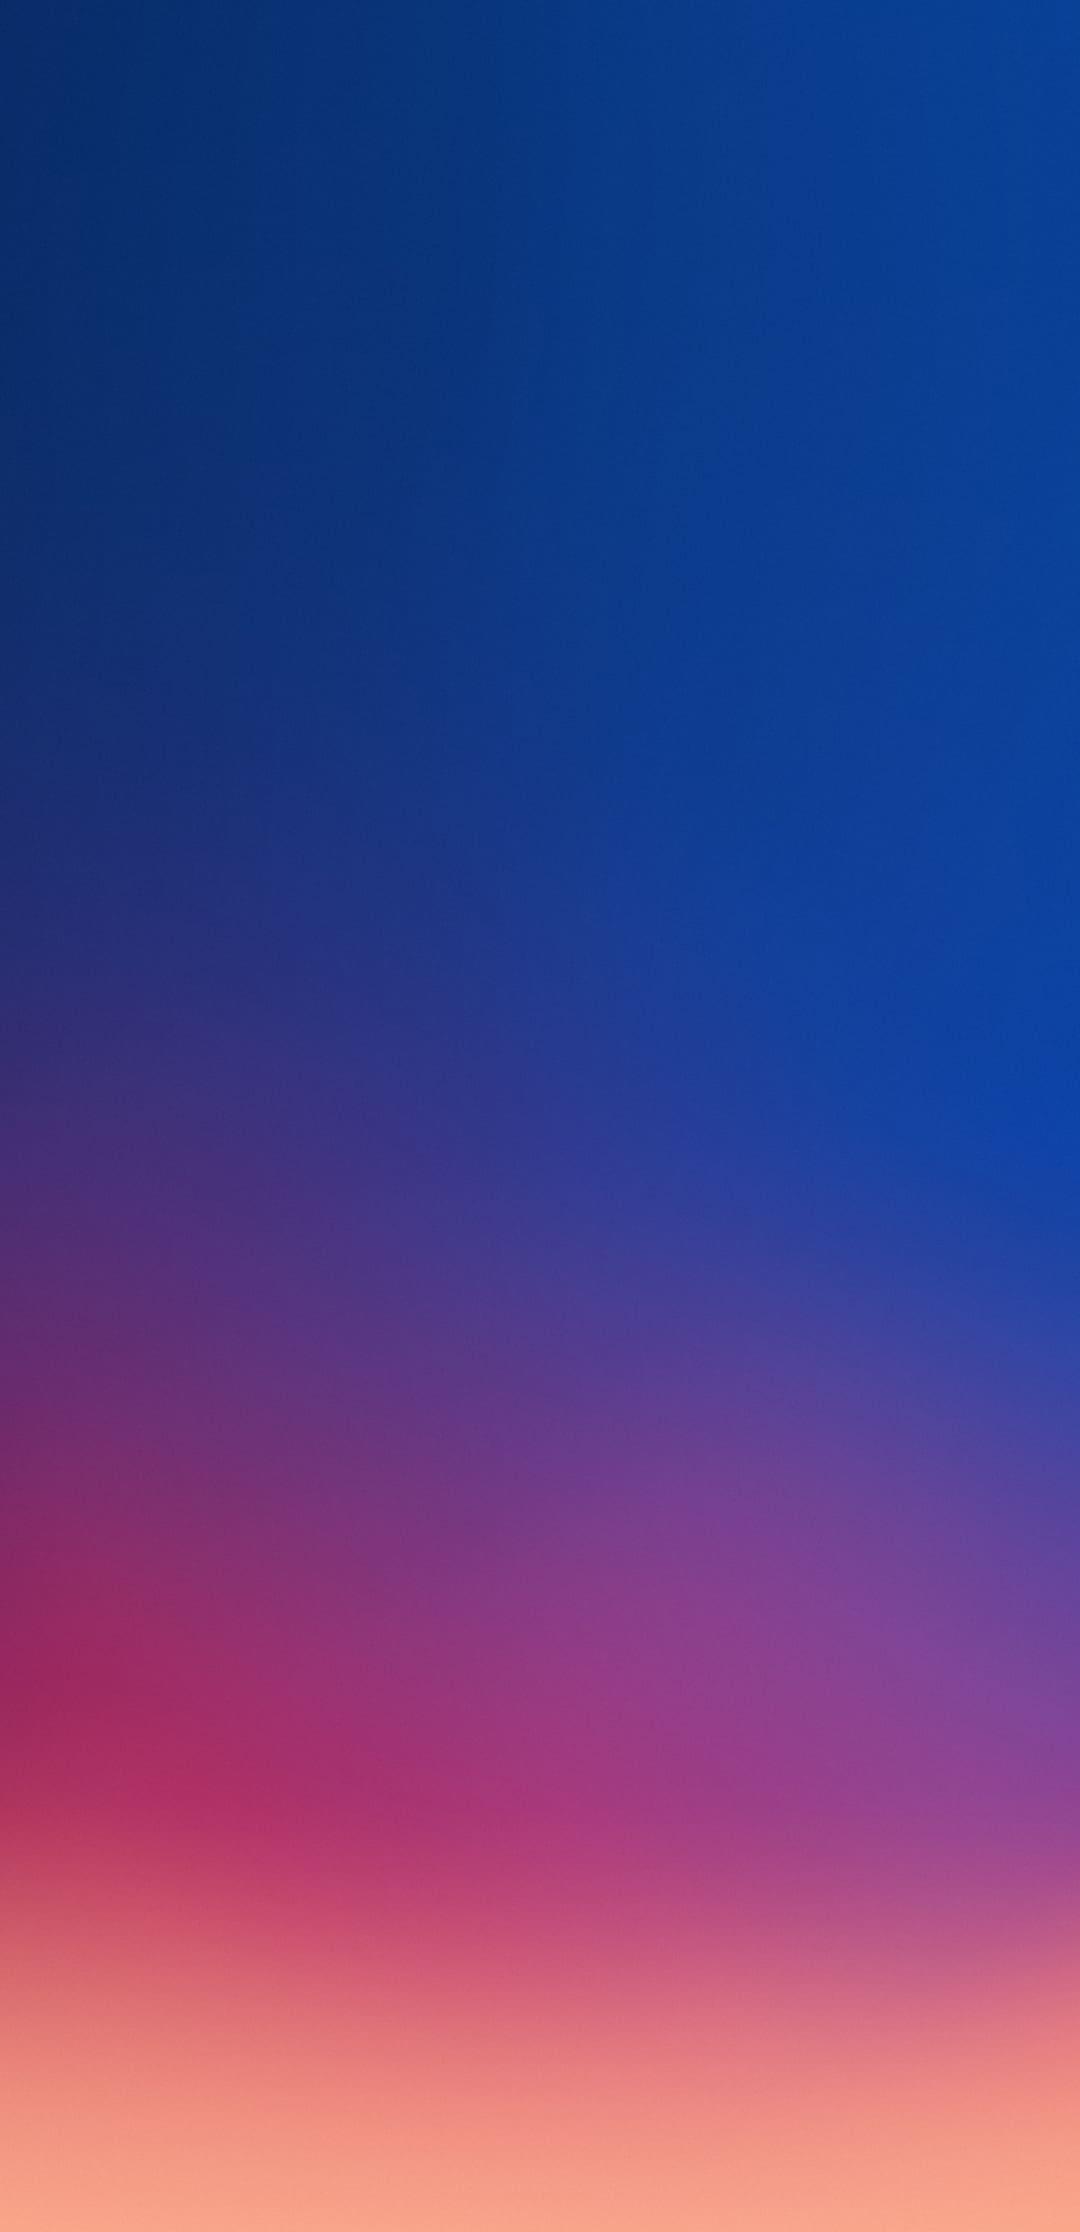 Meizu 16S Stock Wallpapers (1080p) - Download   DroidViews